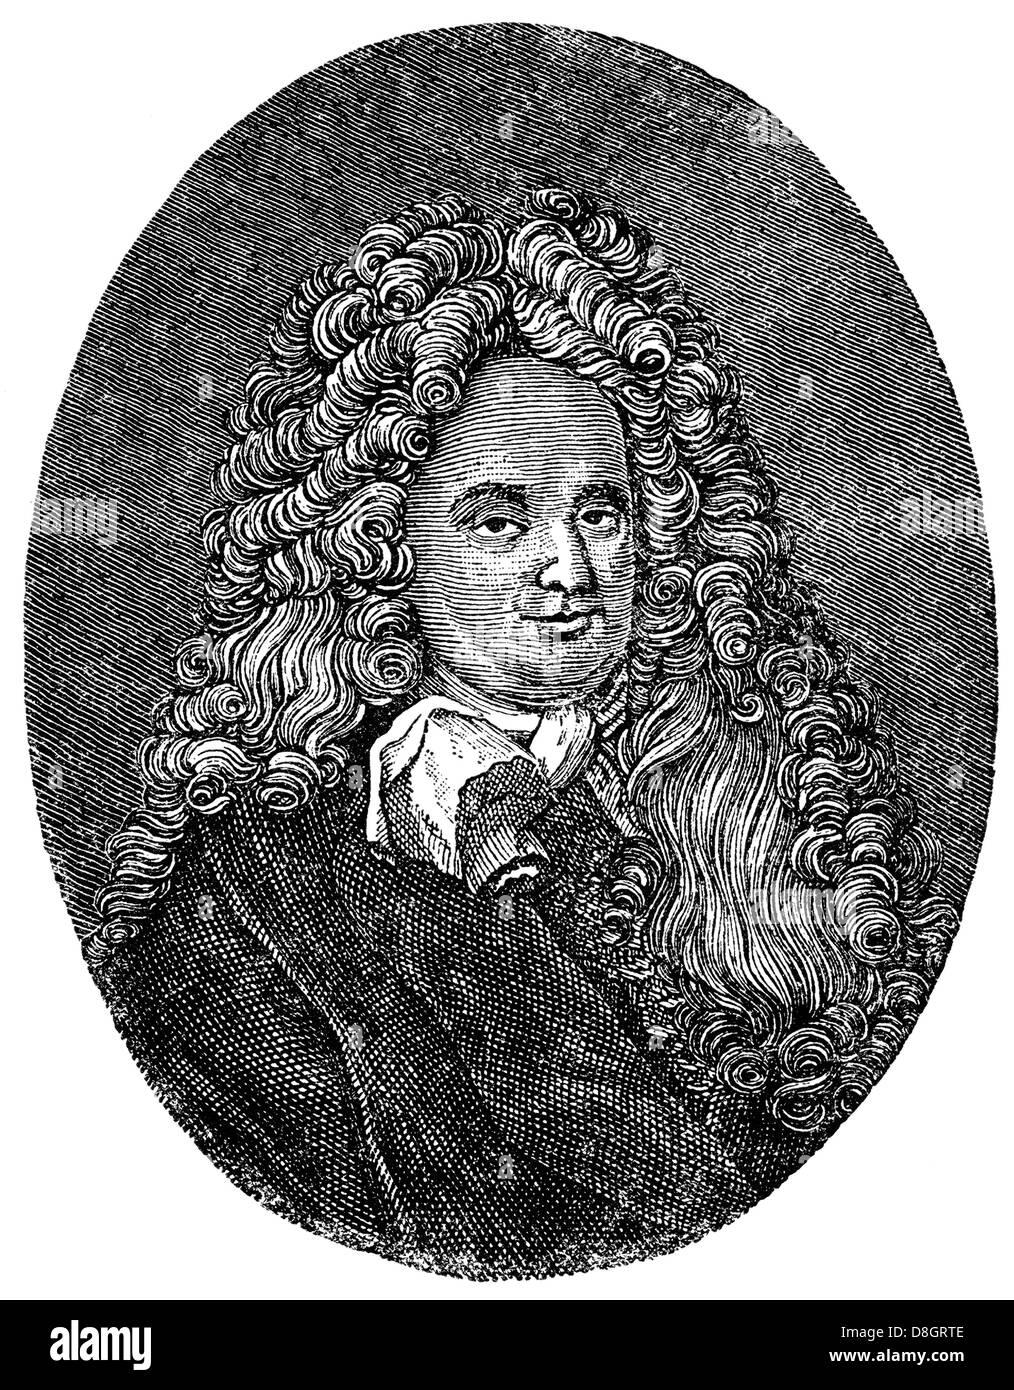 Eberhard von Danckelmann, 1643 - 1722, a German official who served as Prime Minister of Brandenburg-Prussia, 18th - Stock Image